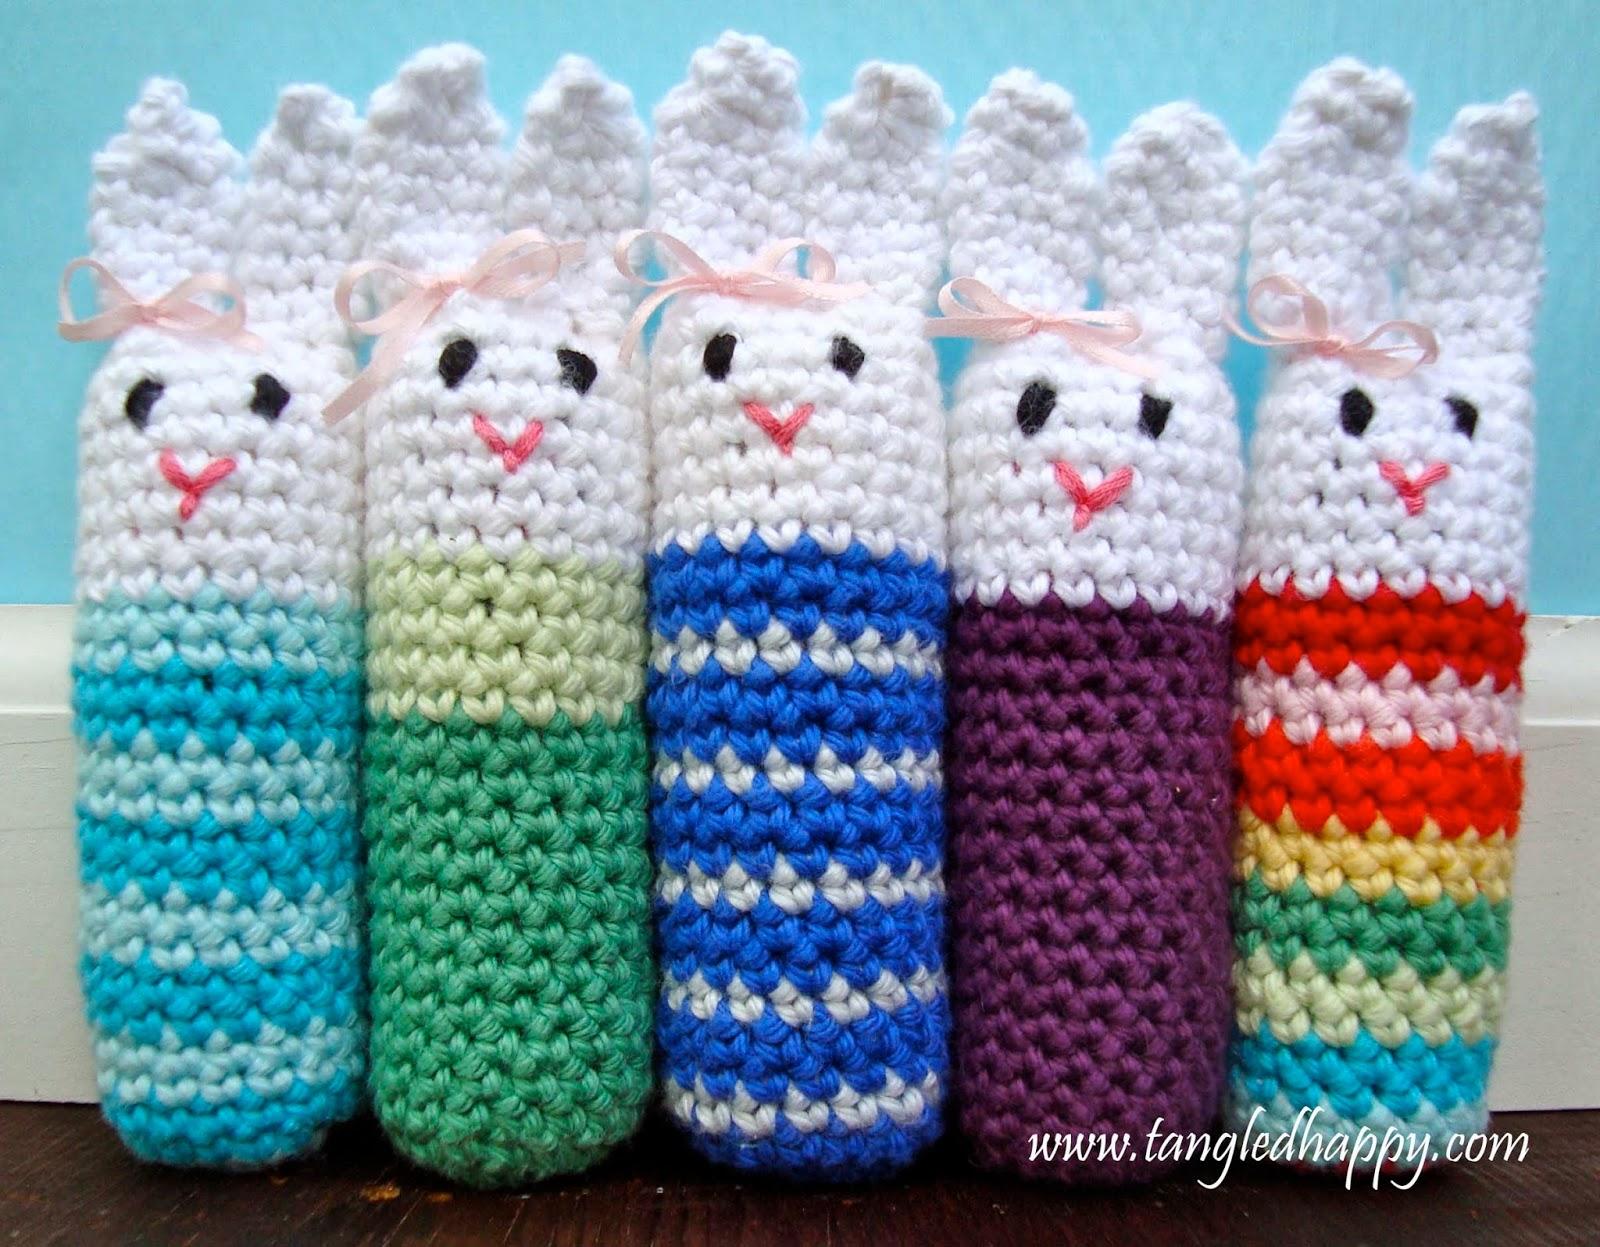 Easy Crochet Amigurumi Free : tangled happy: How To Crochet An Easy Amigurumi Bunny ...